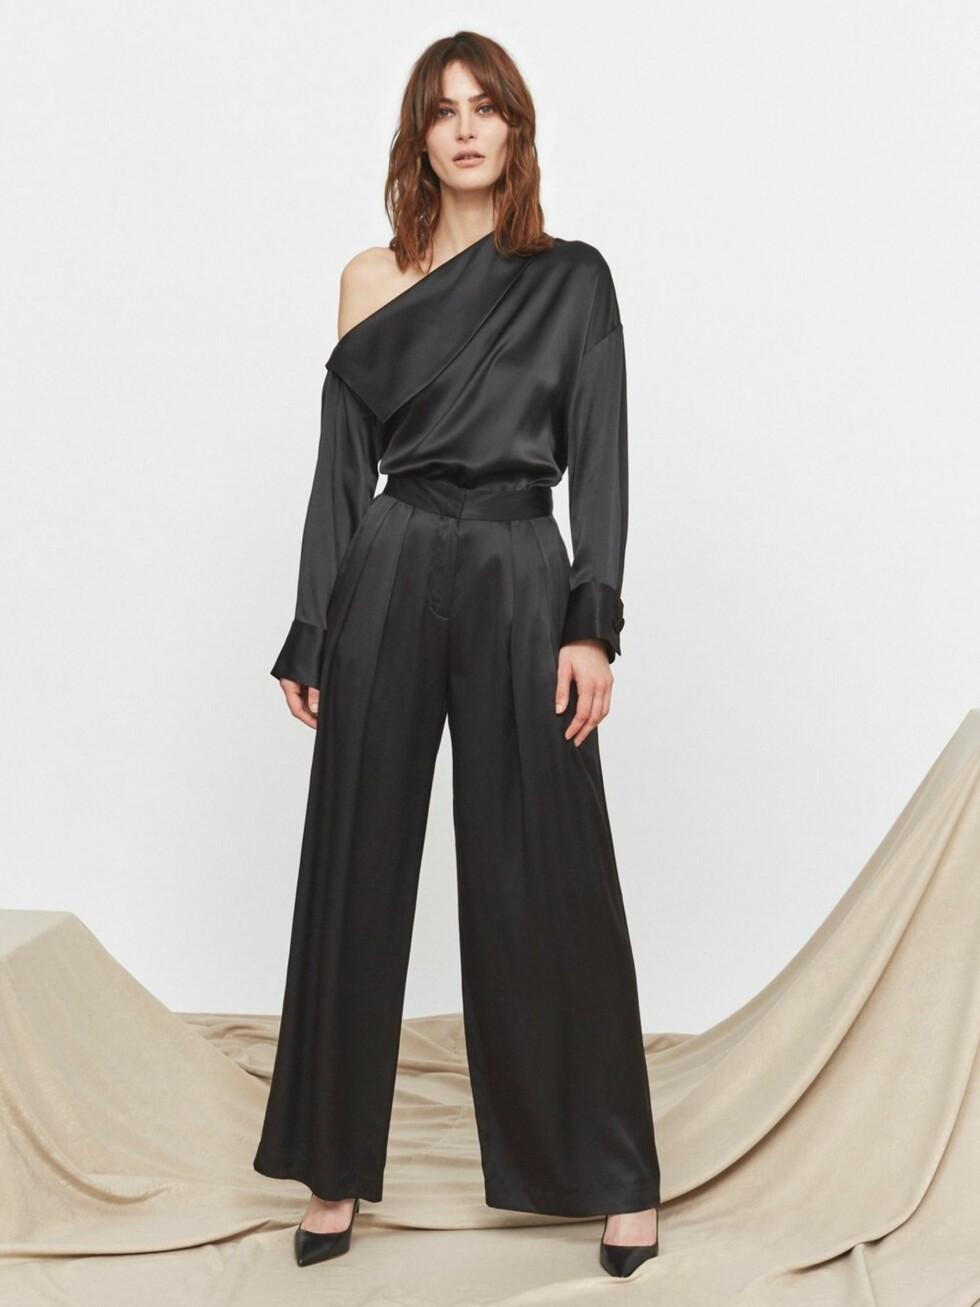 Bukse fra Kitri Studio |1660,-| https://kitristudio.eu/collections/trousers-and-skirts/products/marina-silk-wide-leg-trouser